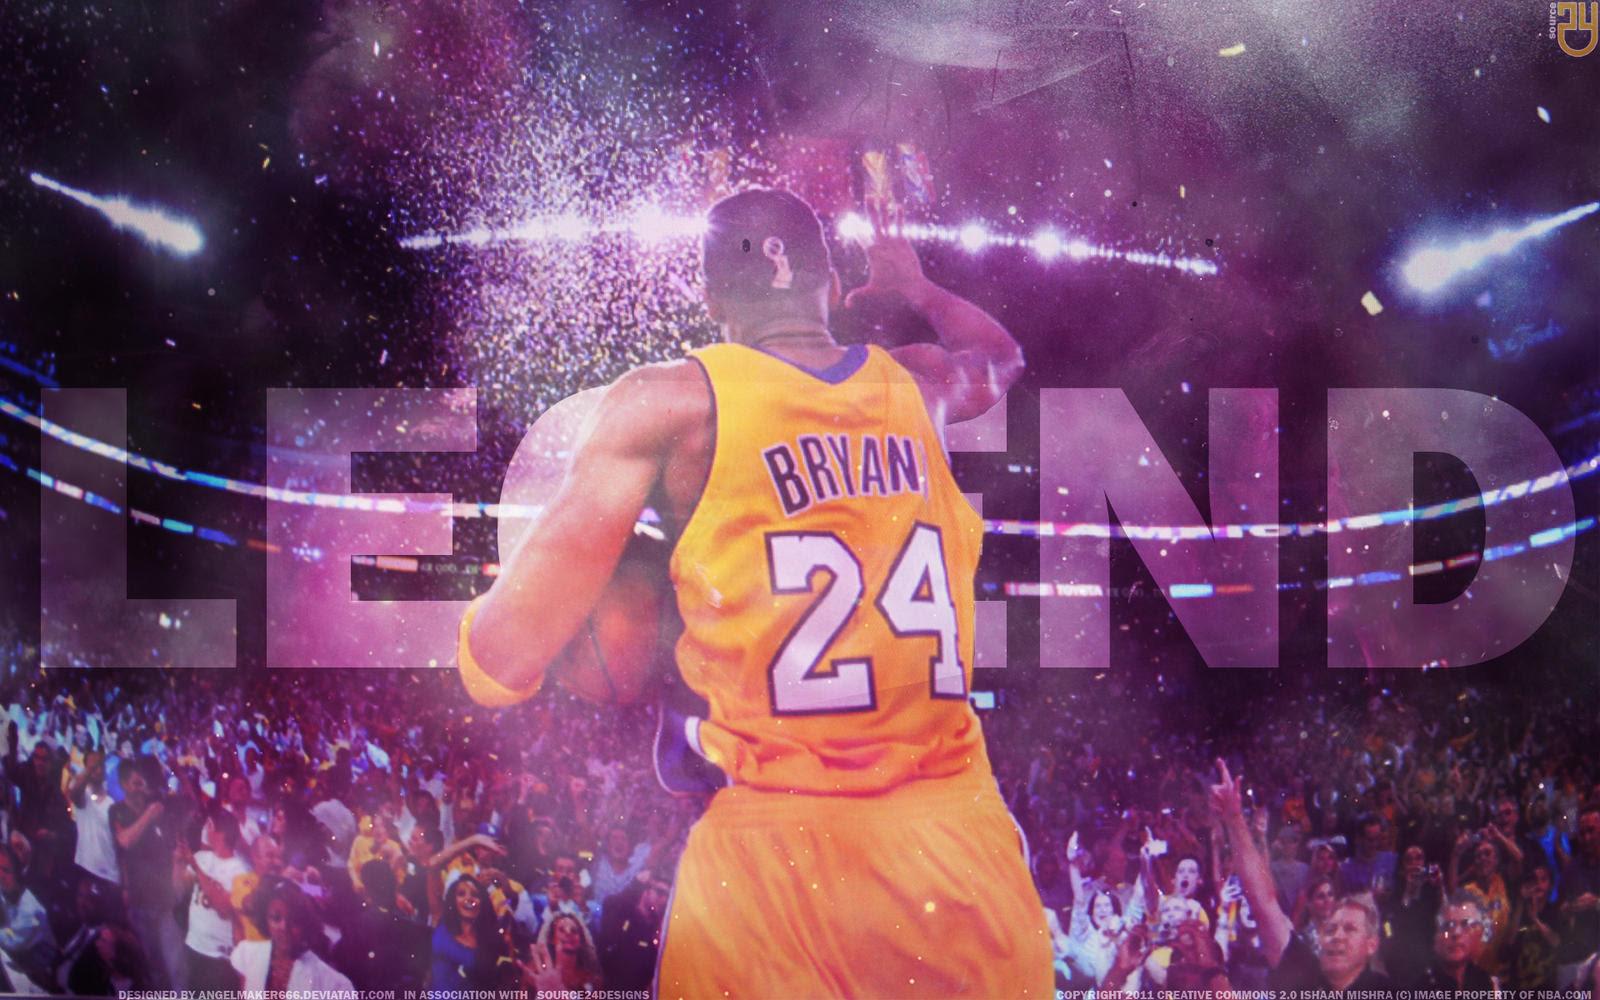 Nba Kobe Bryant Basketball Wallpaper Hd Wallpapers